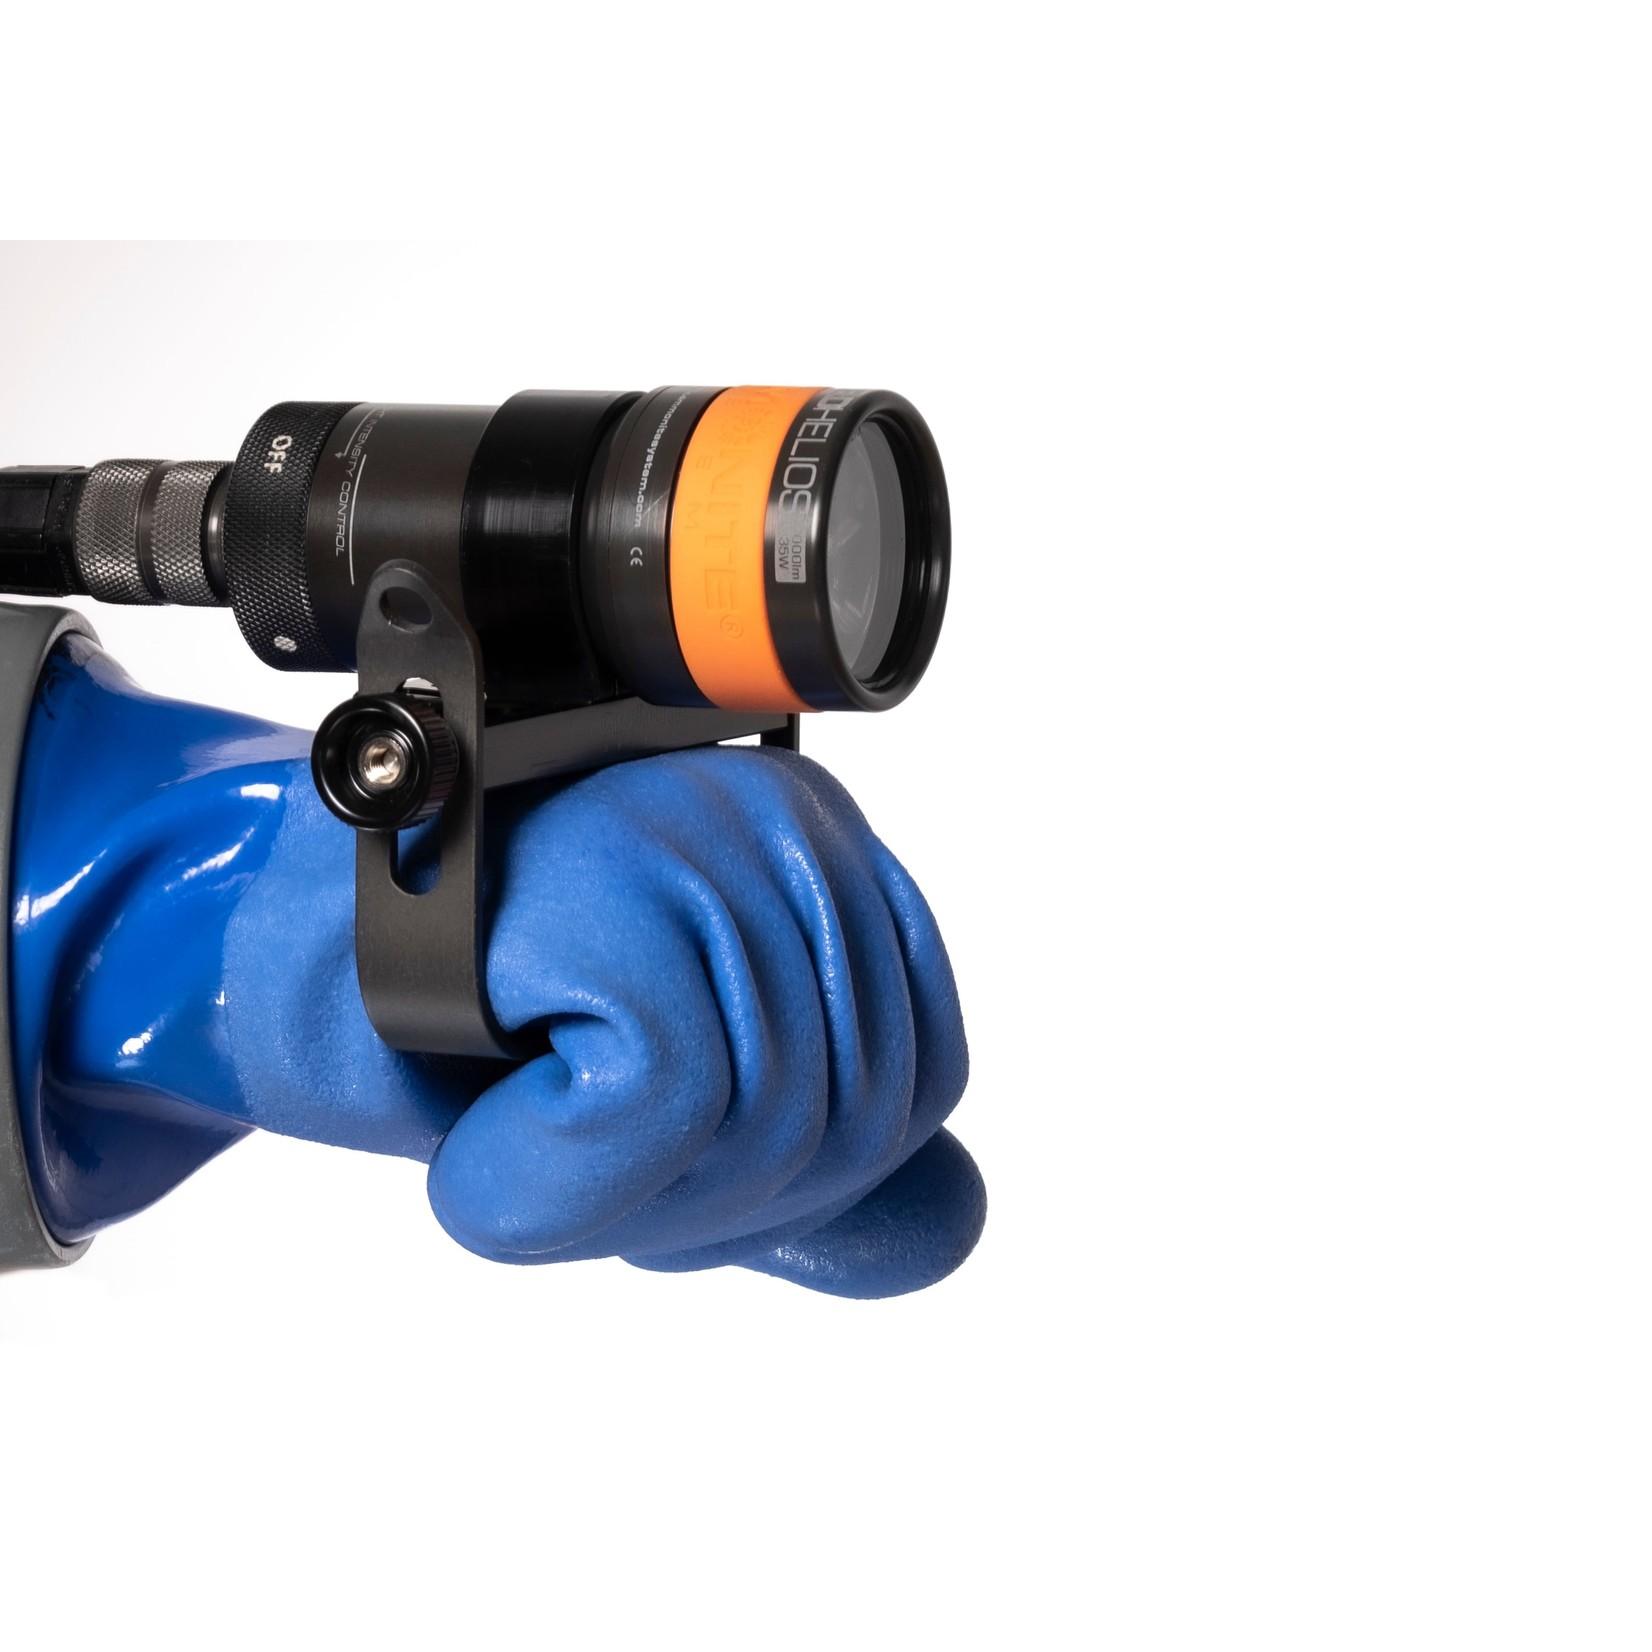 Ammonite Helios set/accu 10Ah/HD cable+case